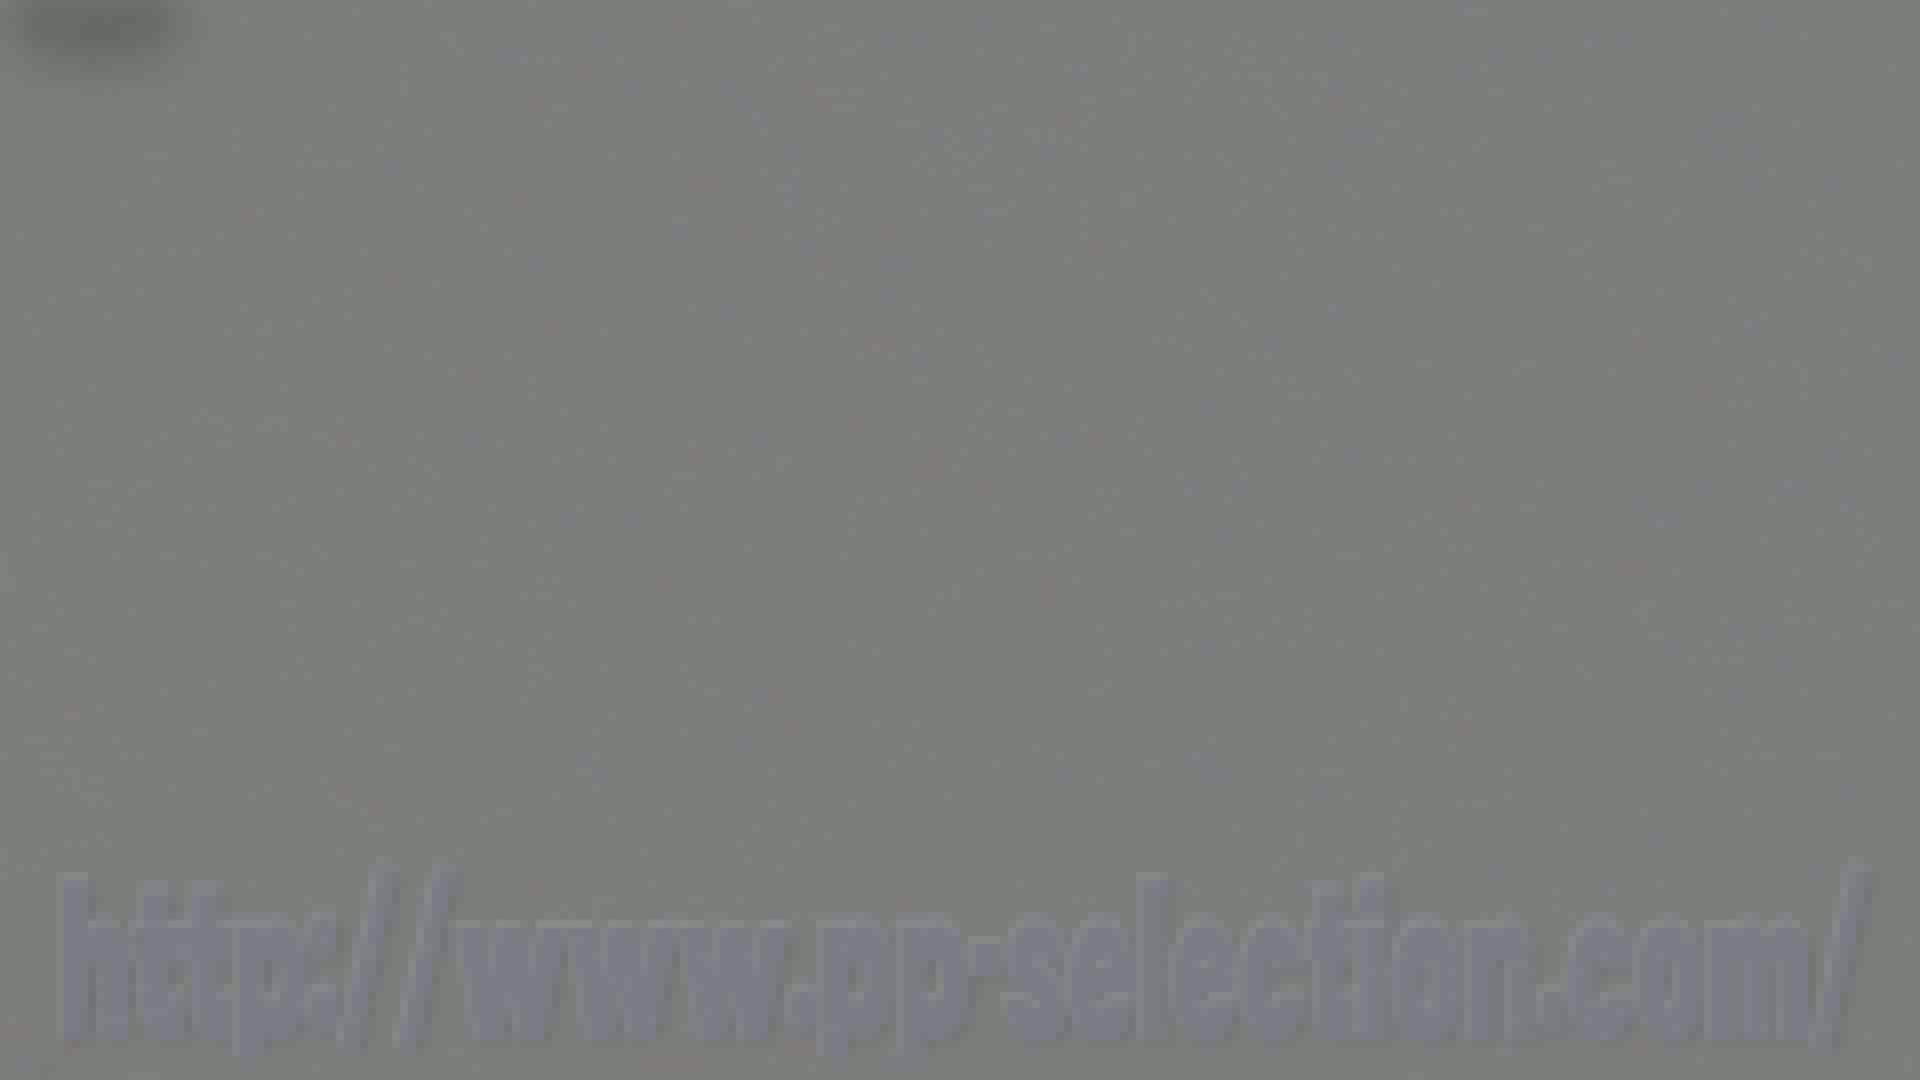 Vol.07 ワンピースの子を獲物を狩るようにくっ付いて追い撮り 0 | 0  97連発 65